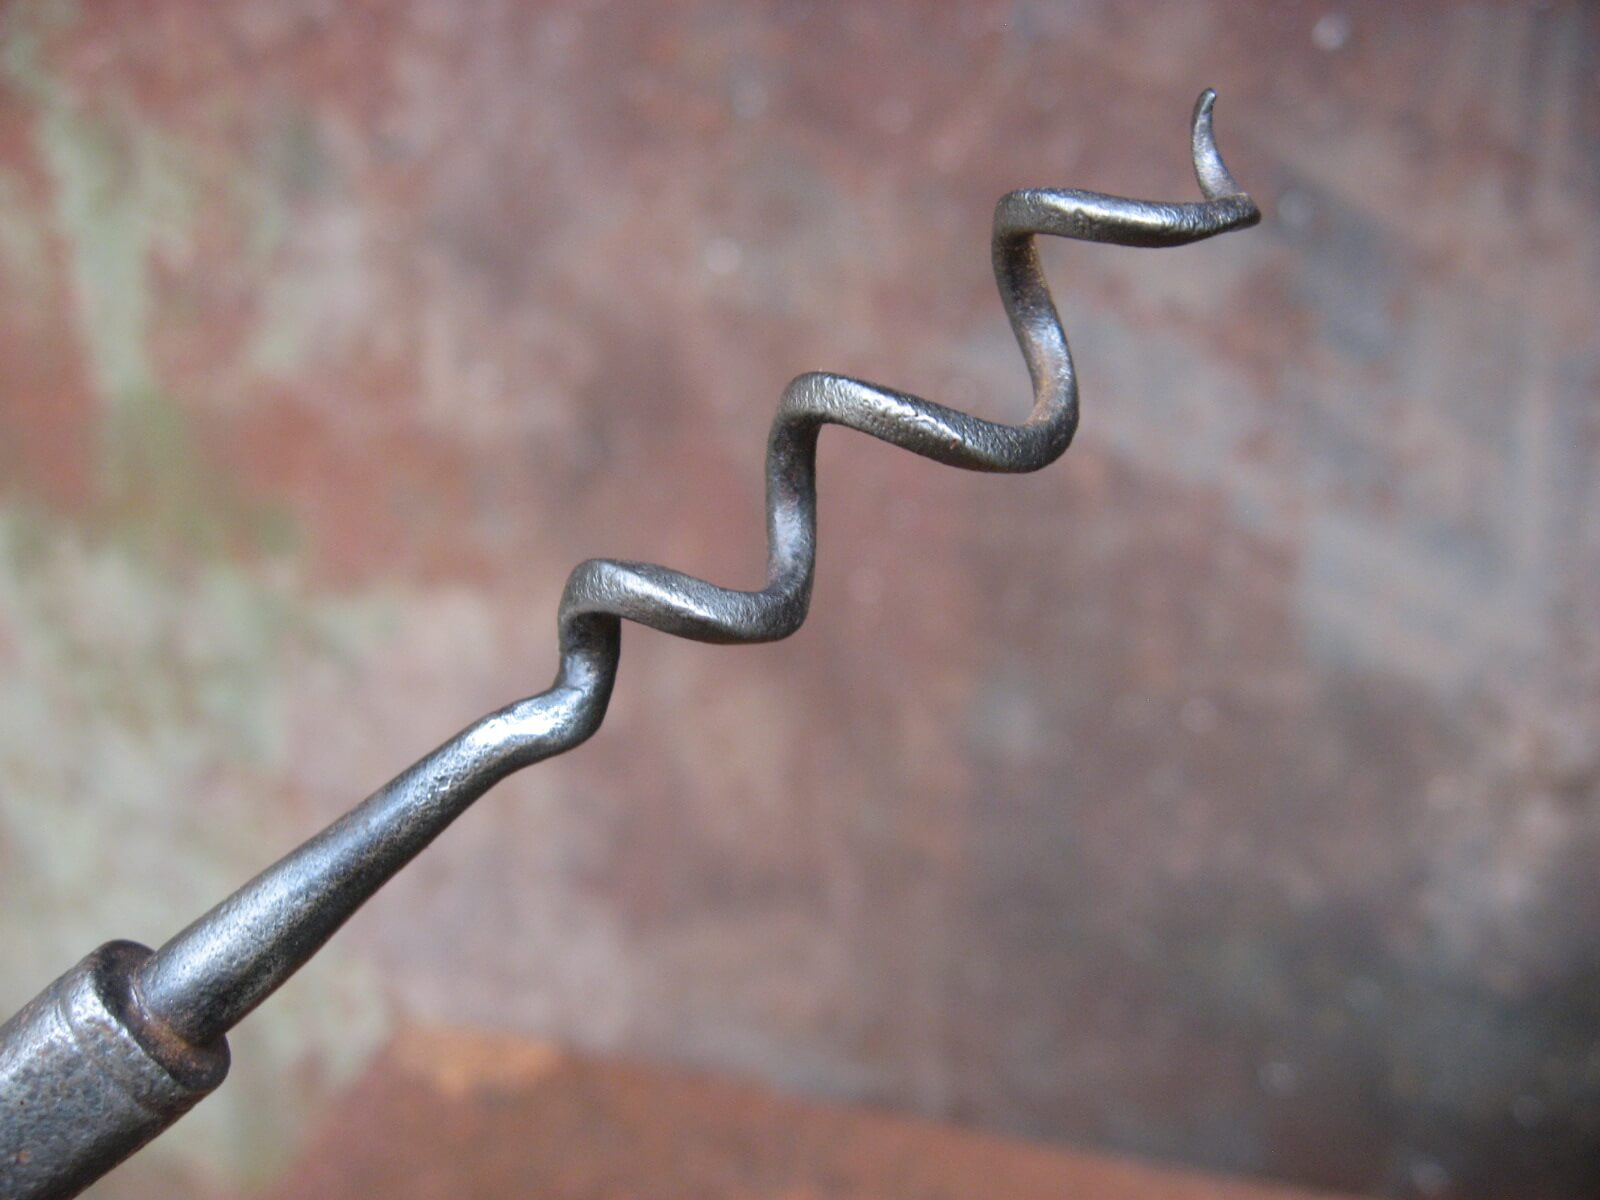 Antique 19th century corkscrews at PumpjackPiddlewick